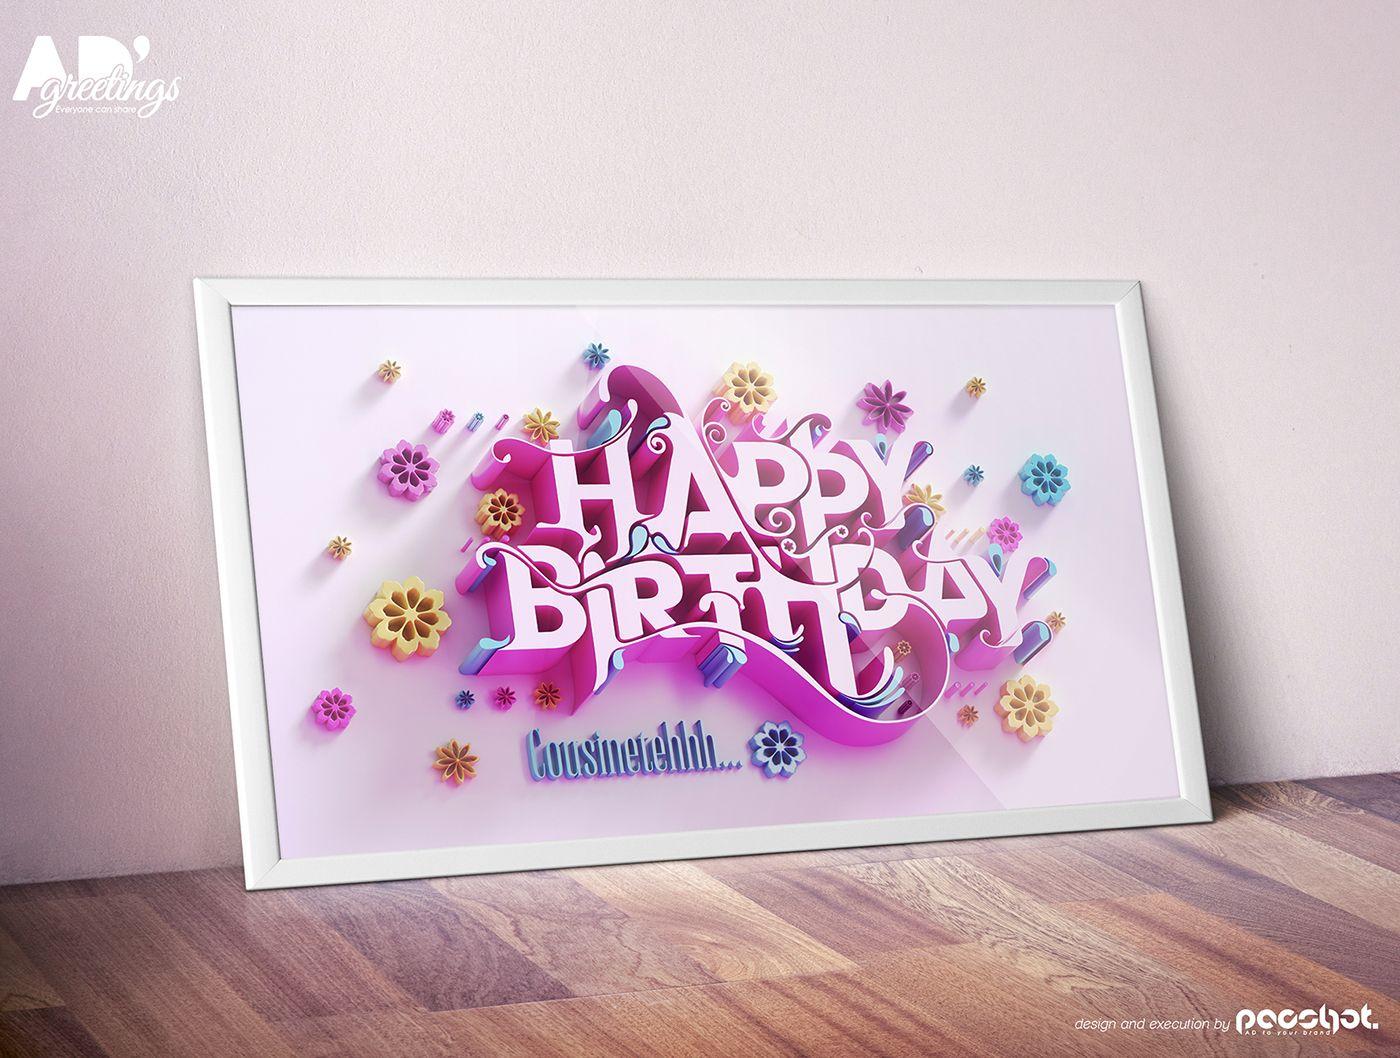 Happy birthday greeting card 2 on behance 3dtypography happy birthday greeting card 2 on behance 3dtypography 3dtypography 3d typography kristyandbryce Choice Image